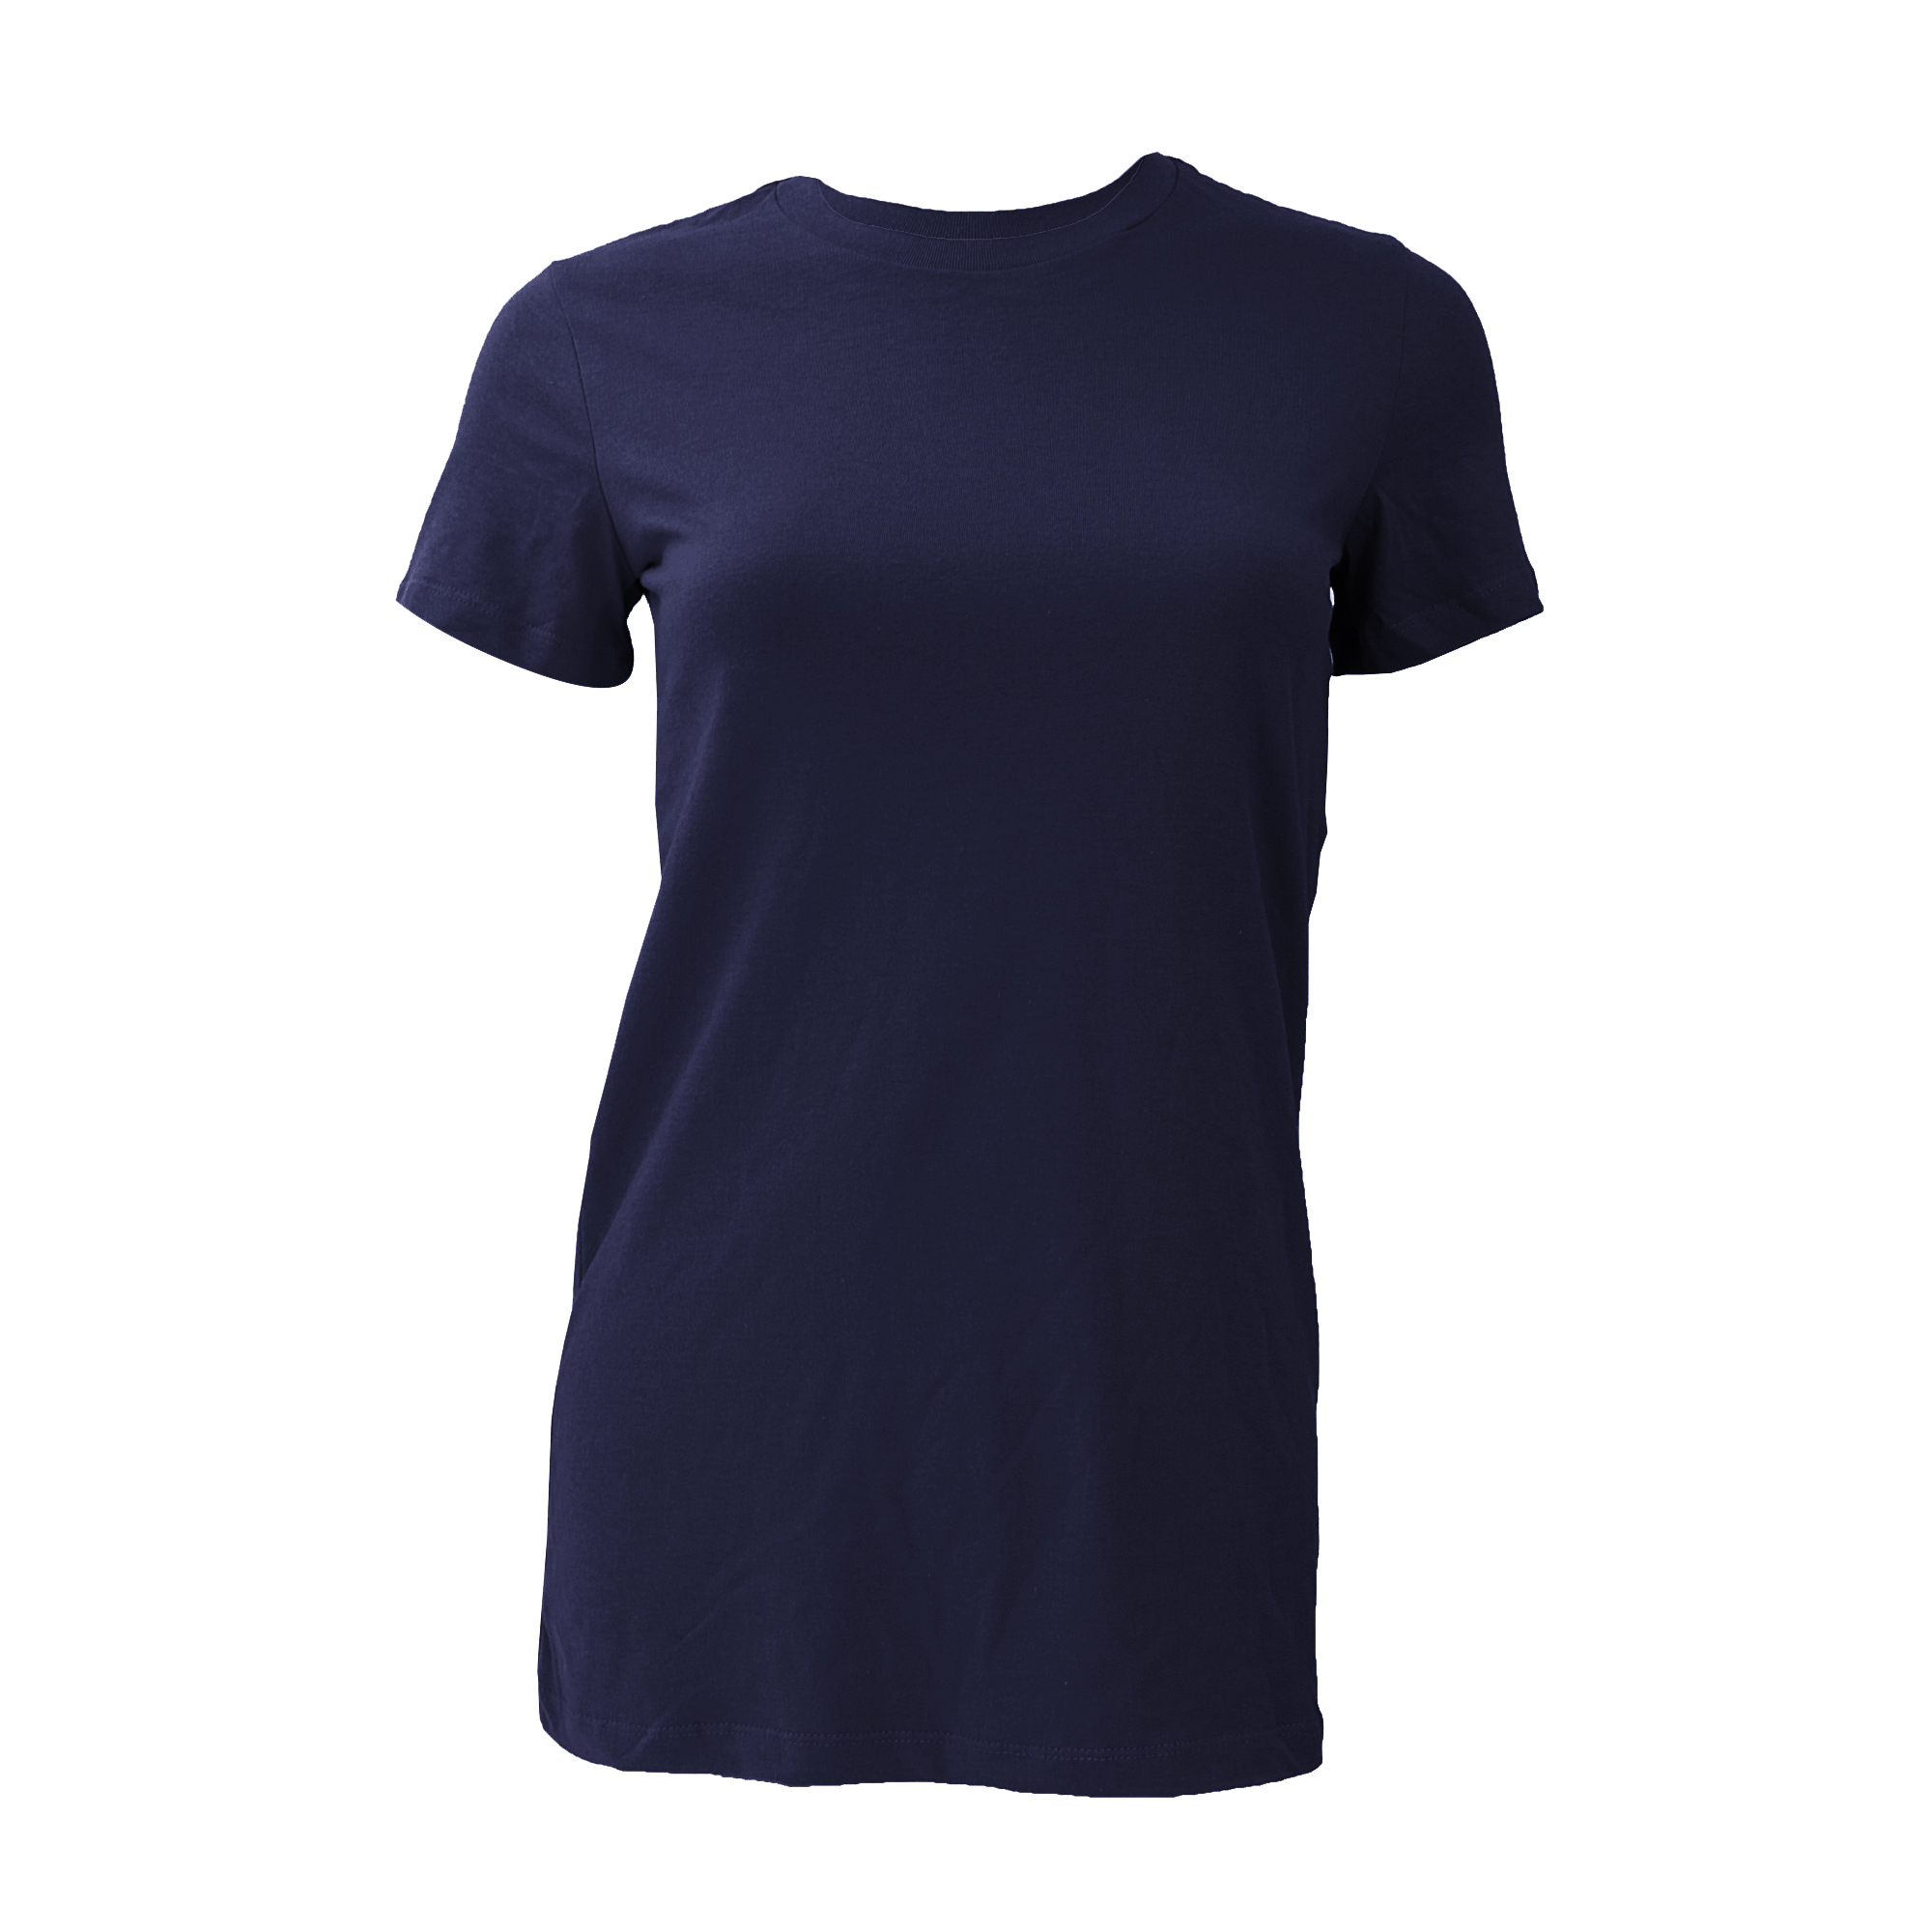 Bella Ladies/Womens The Favourite Tee Short Sleeve T-Shirt (XL) (Team Purple)